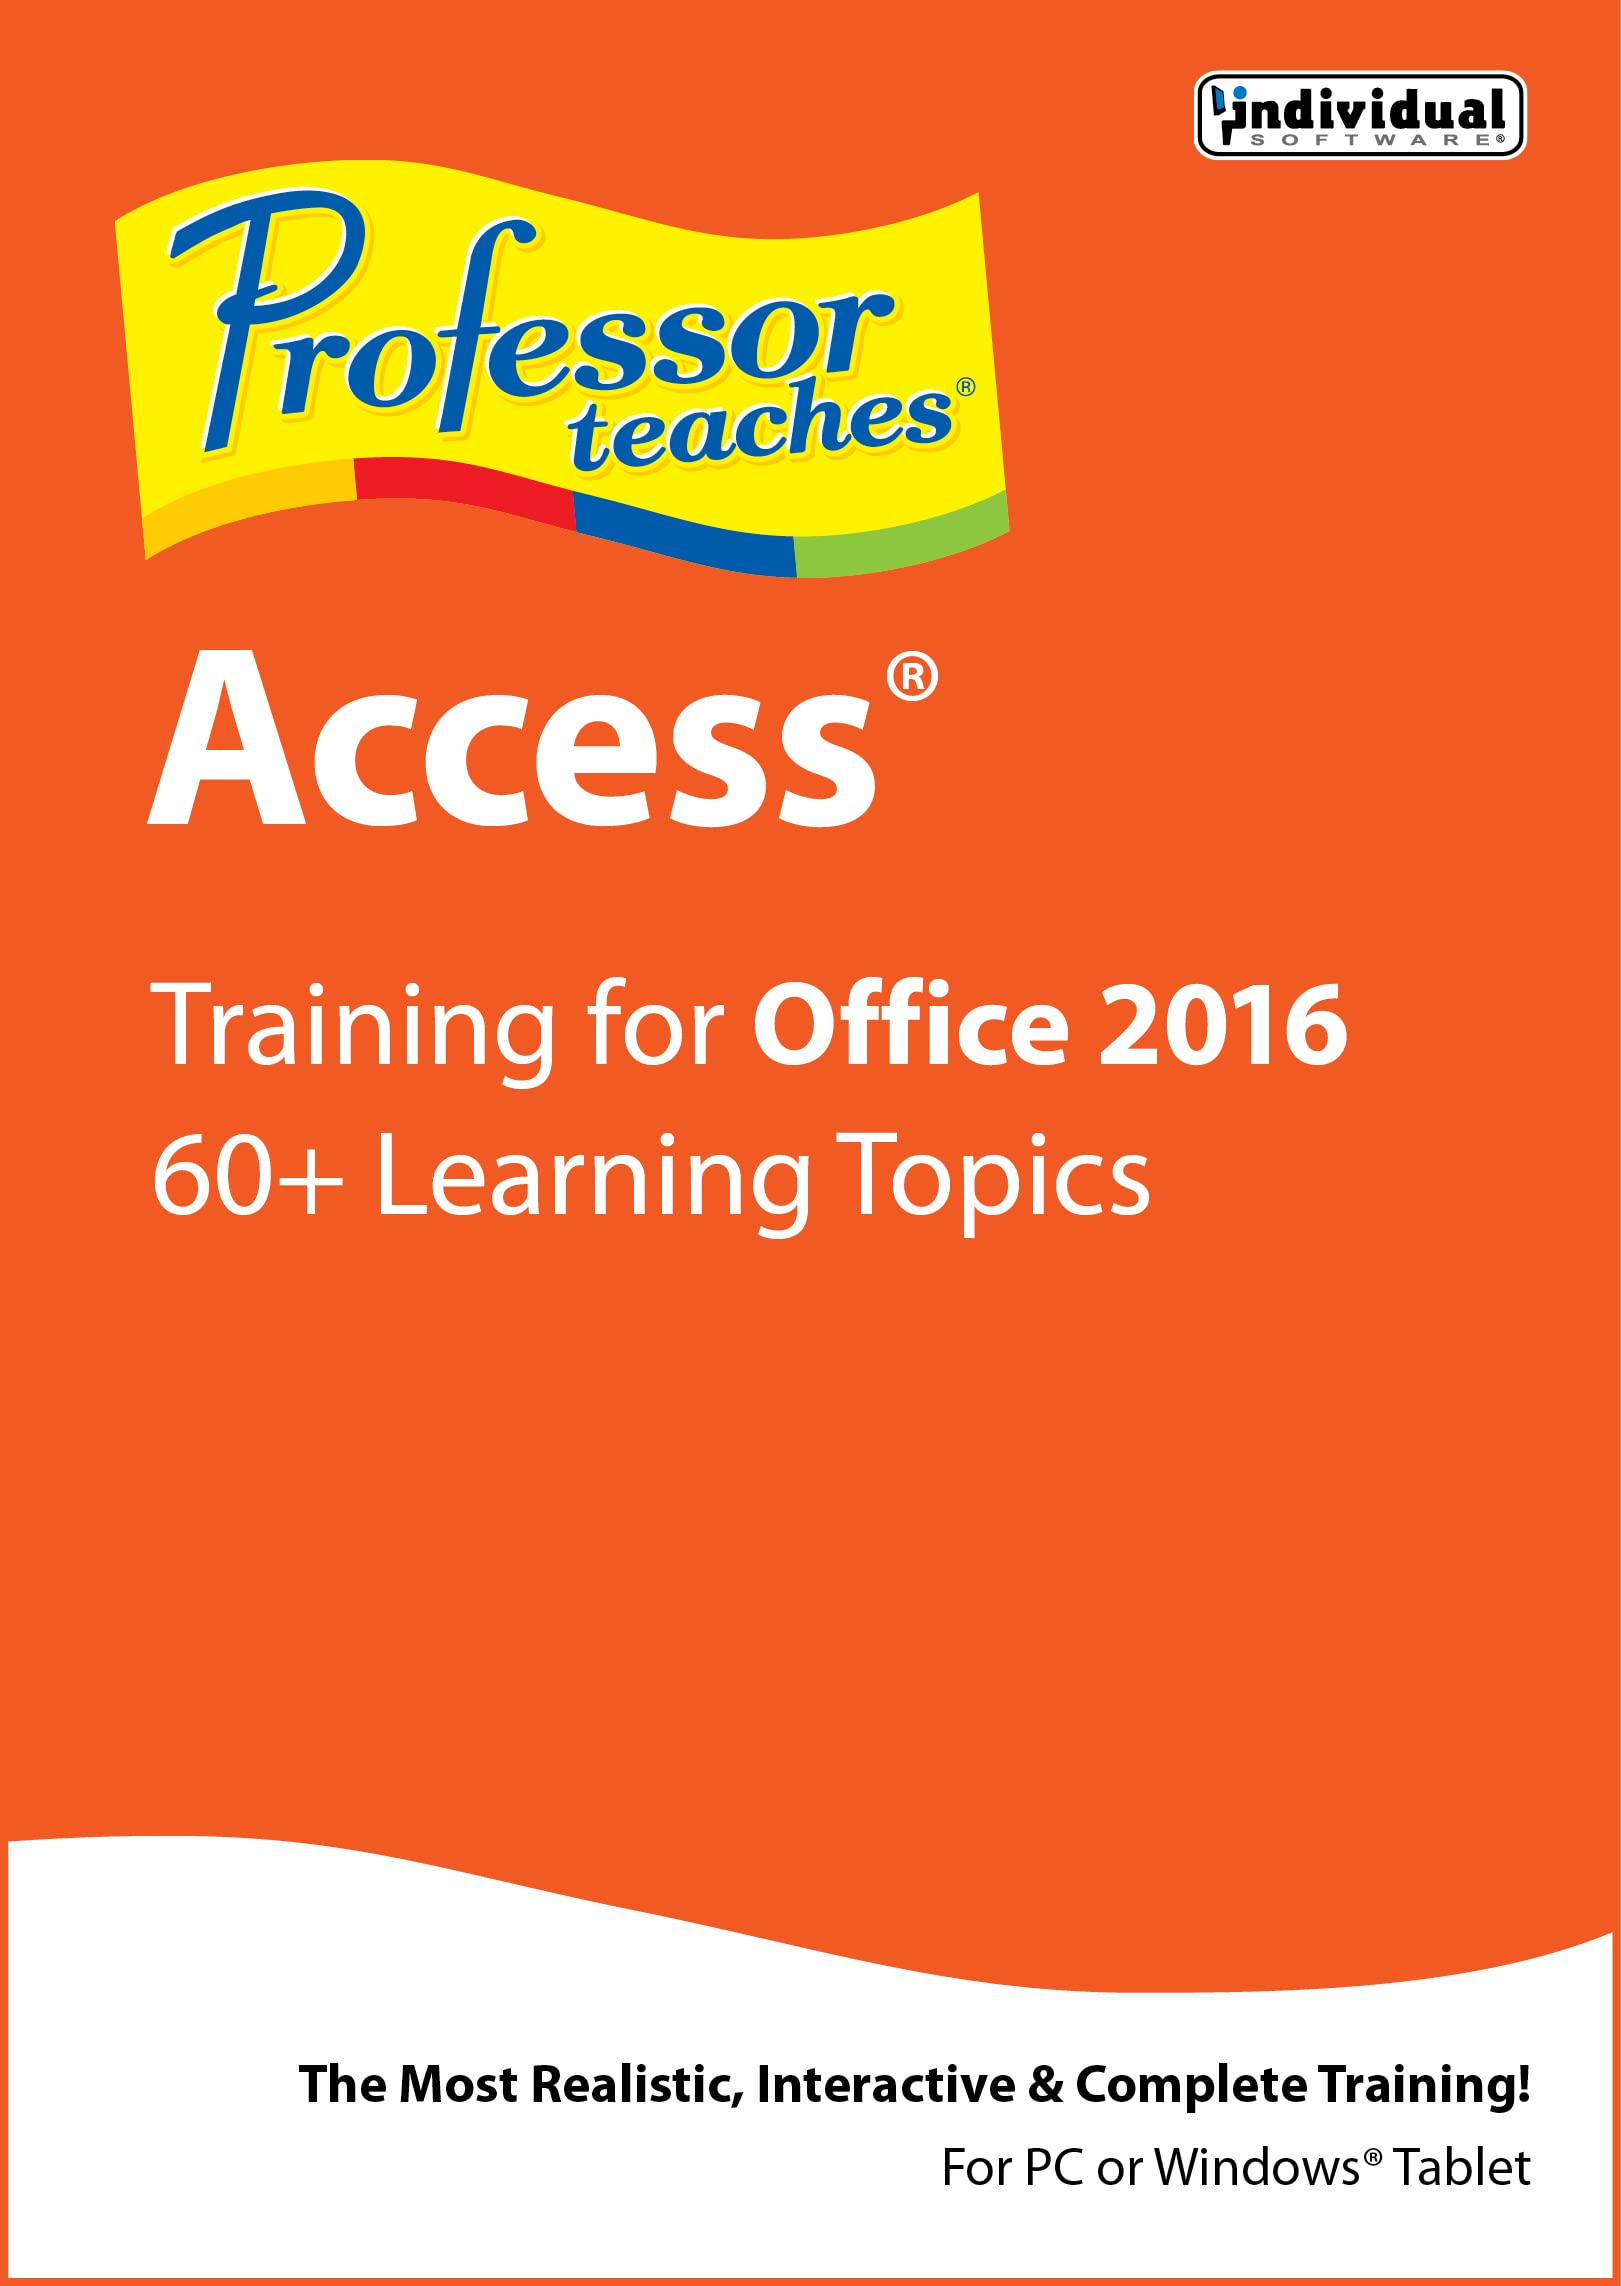 Professor Albuquerque Mall Teaches Access Download Now on sale 2016